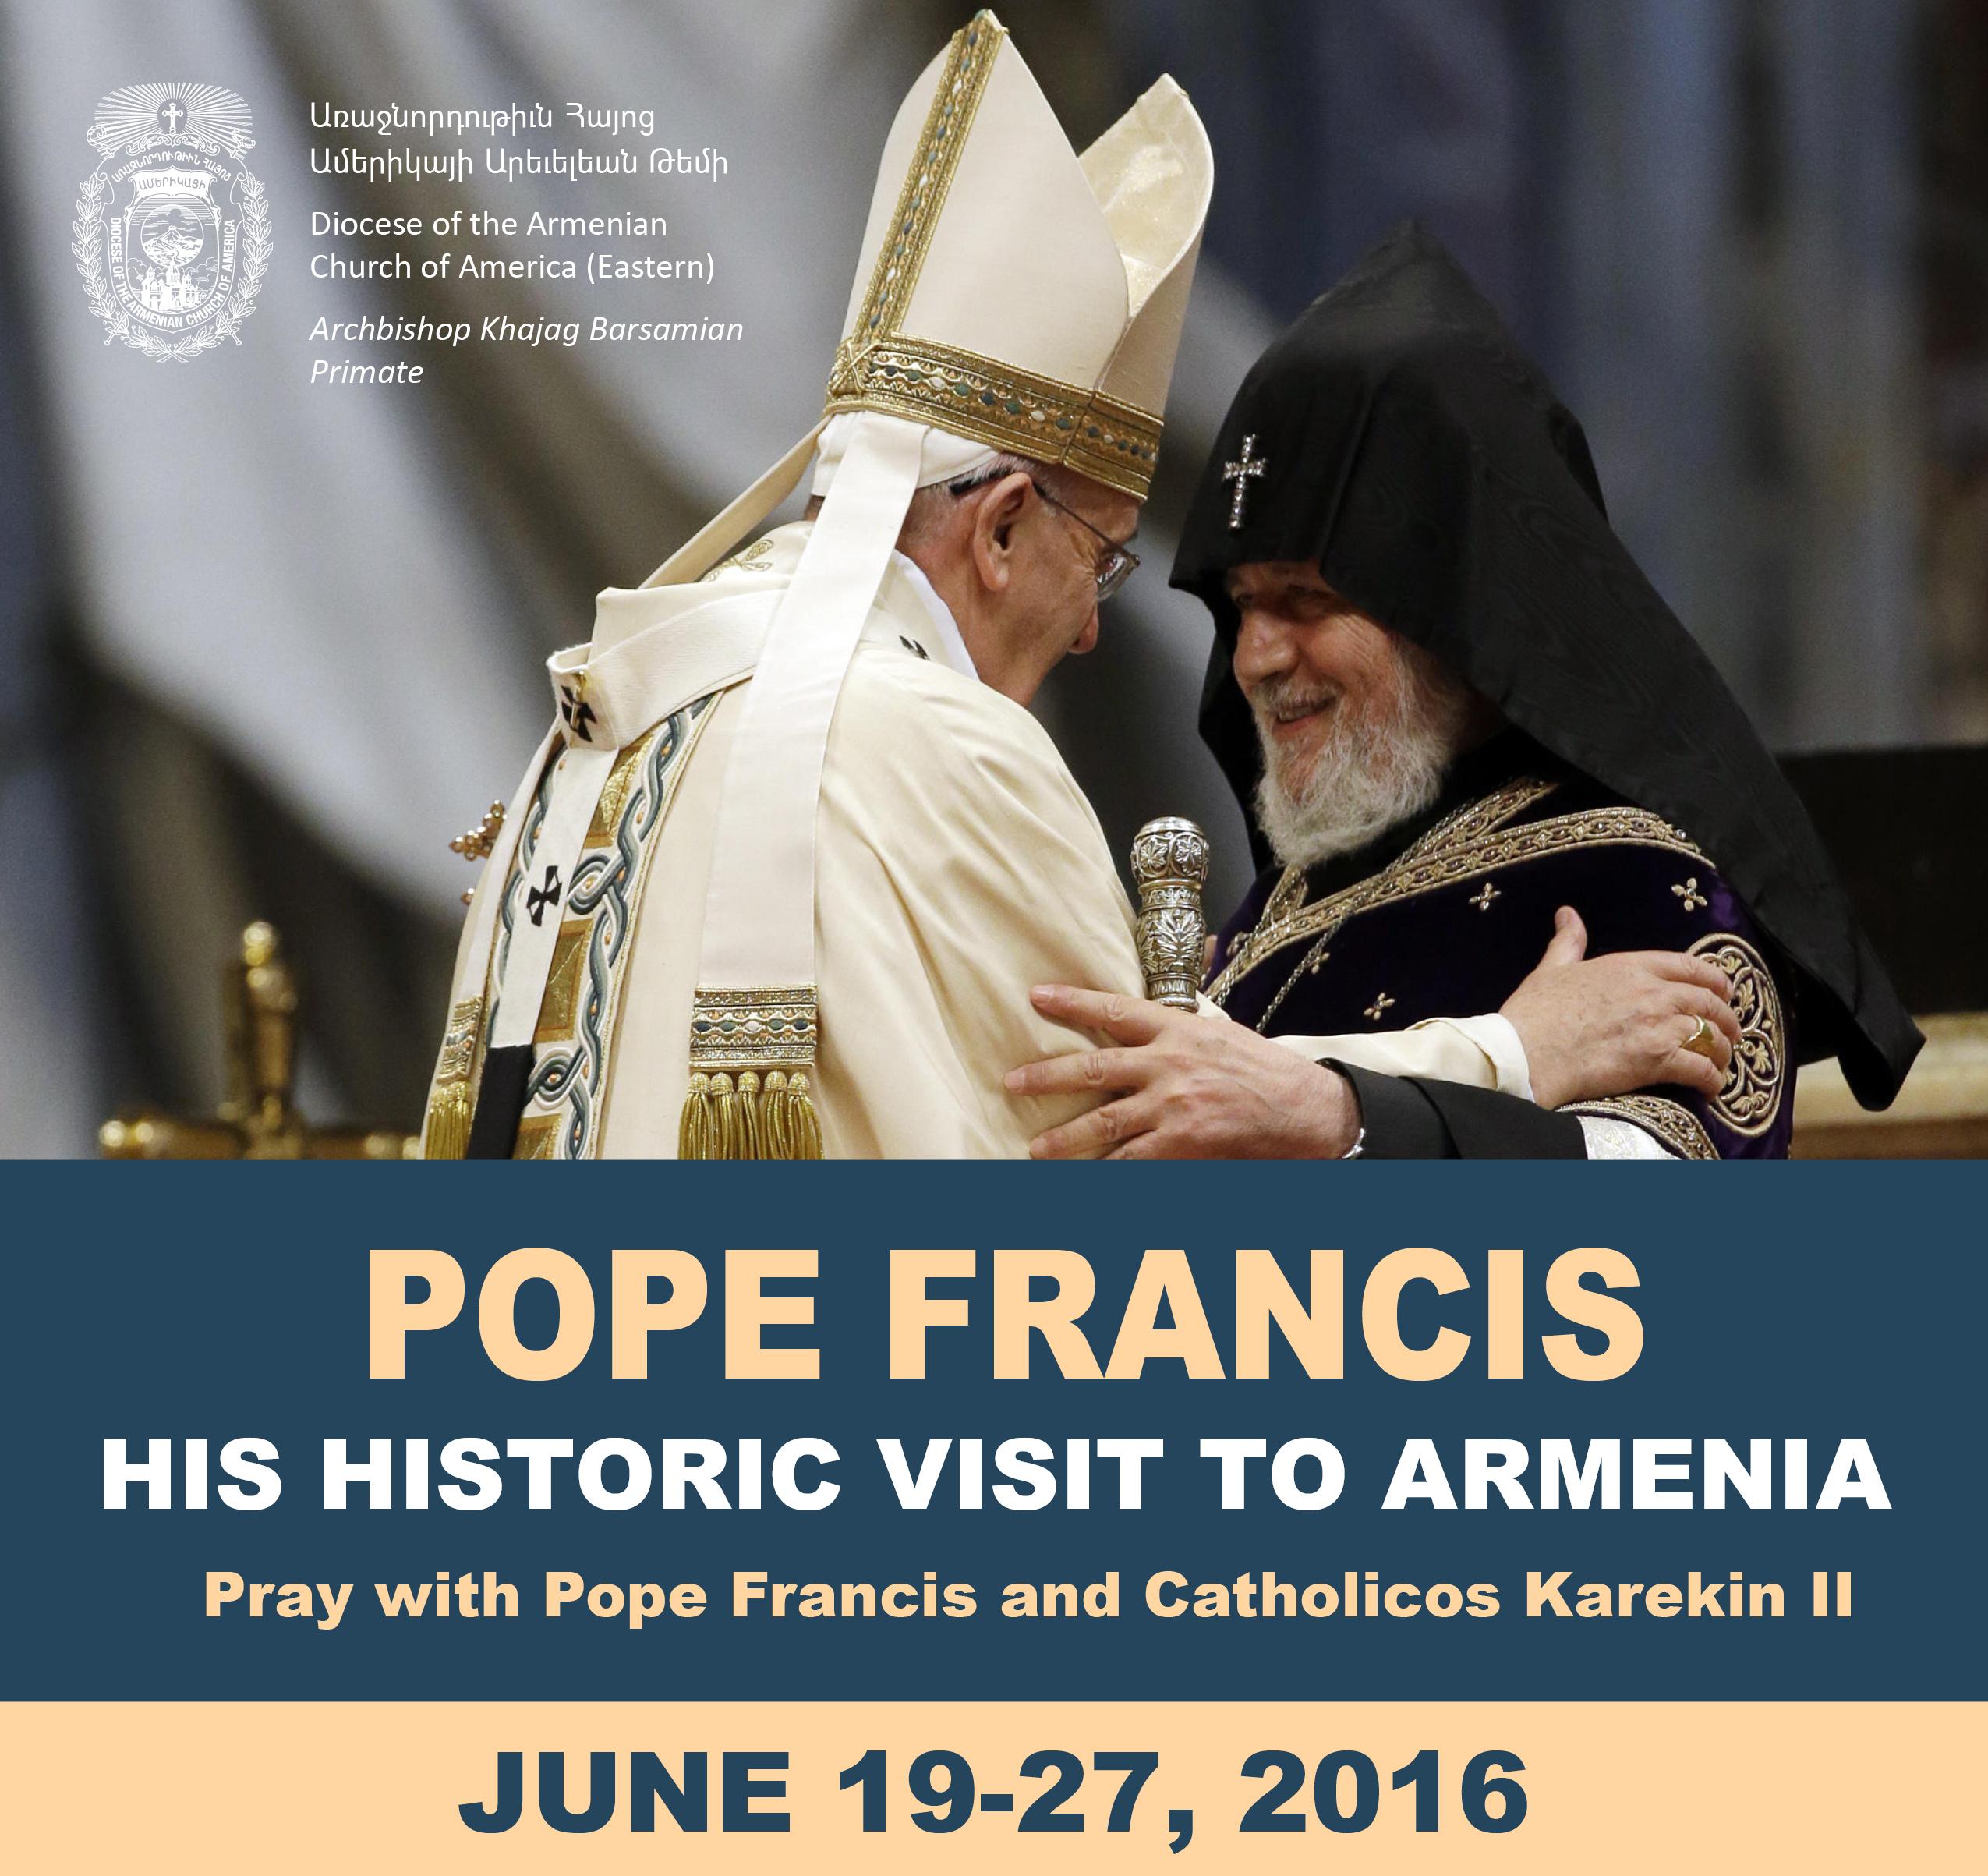 Pope Francis to Visit Armenia